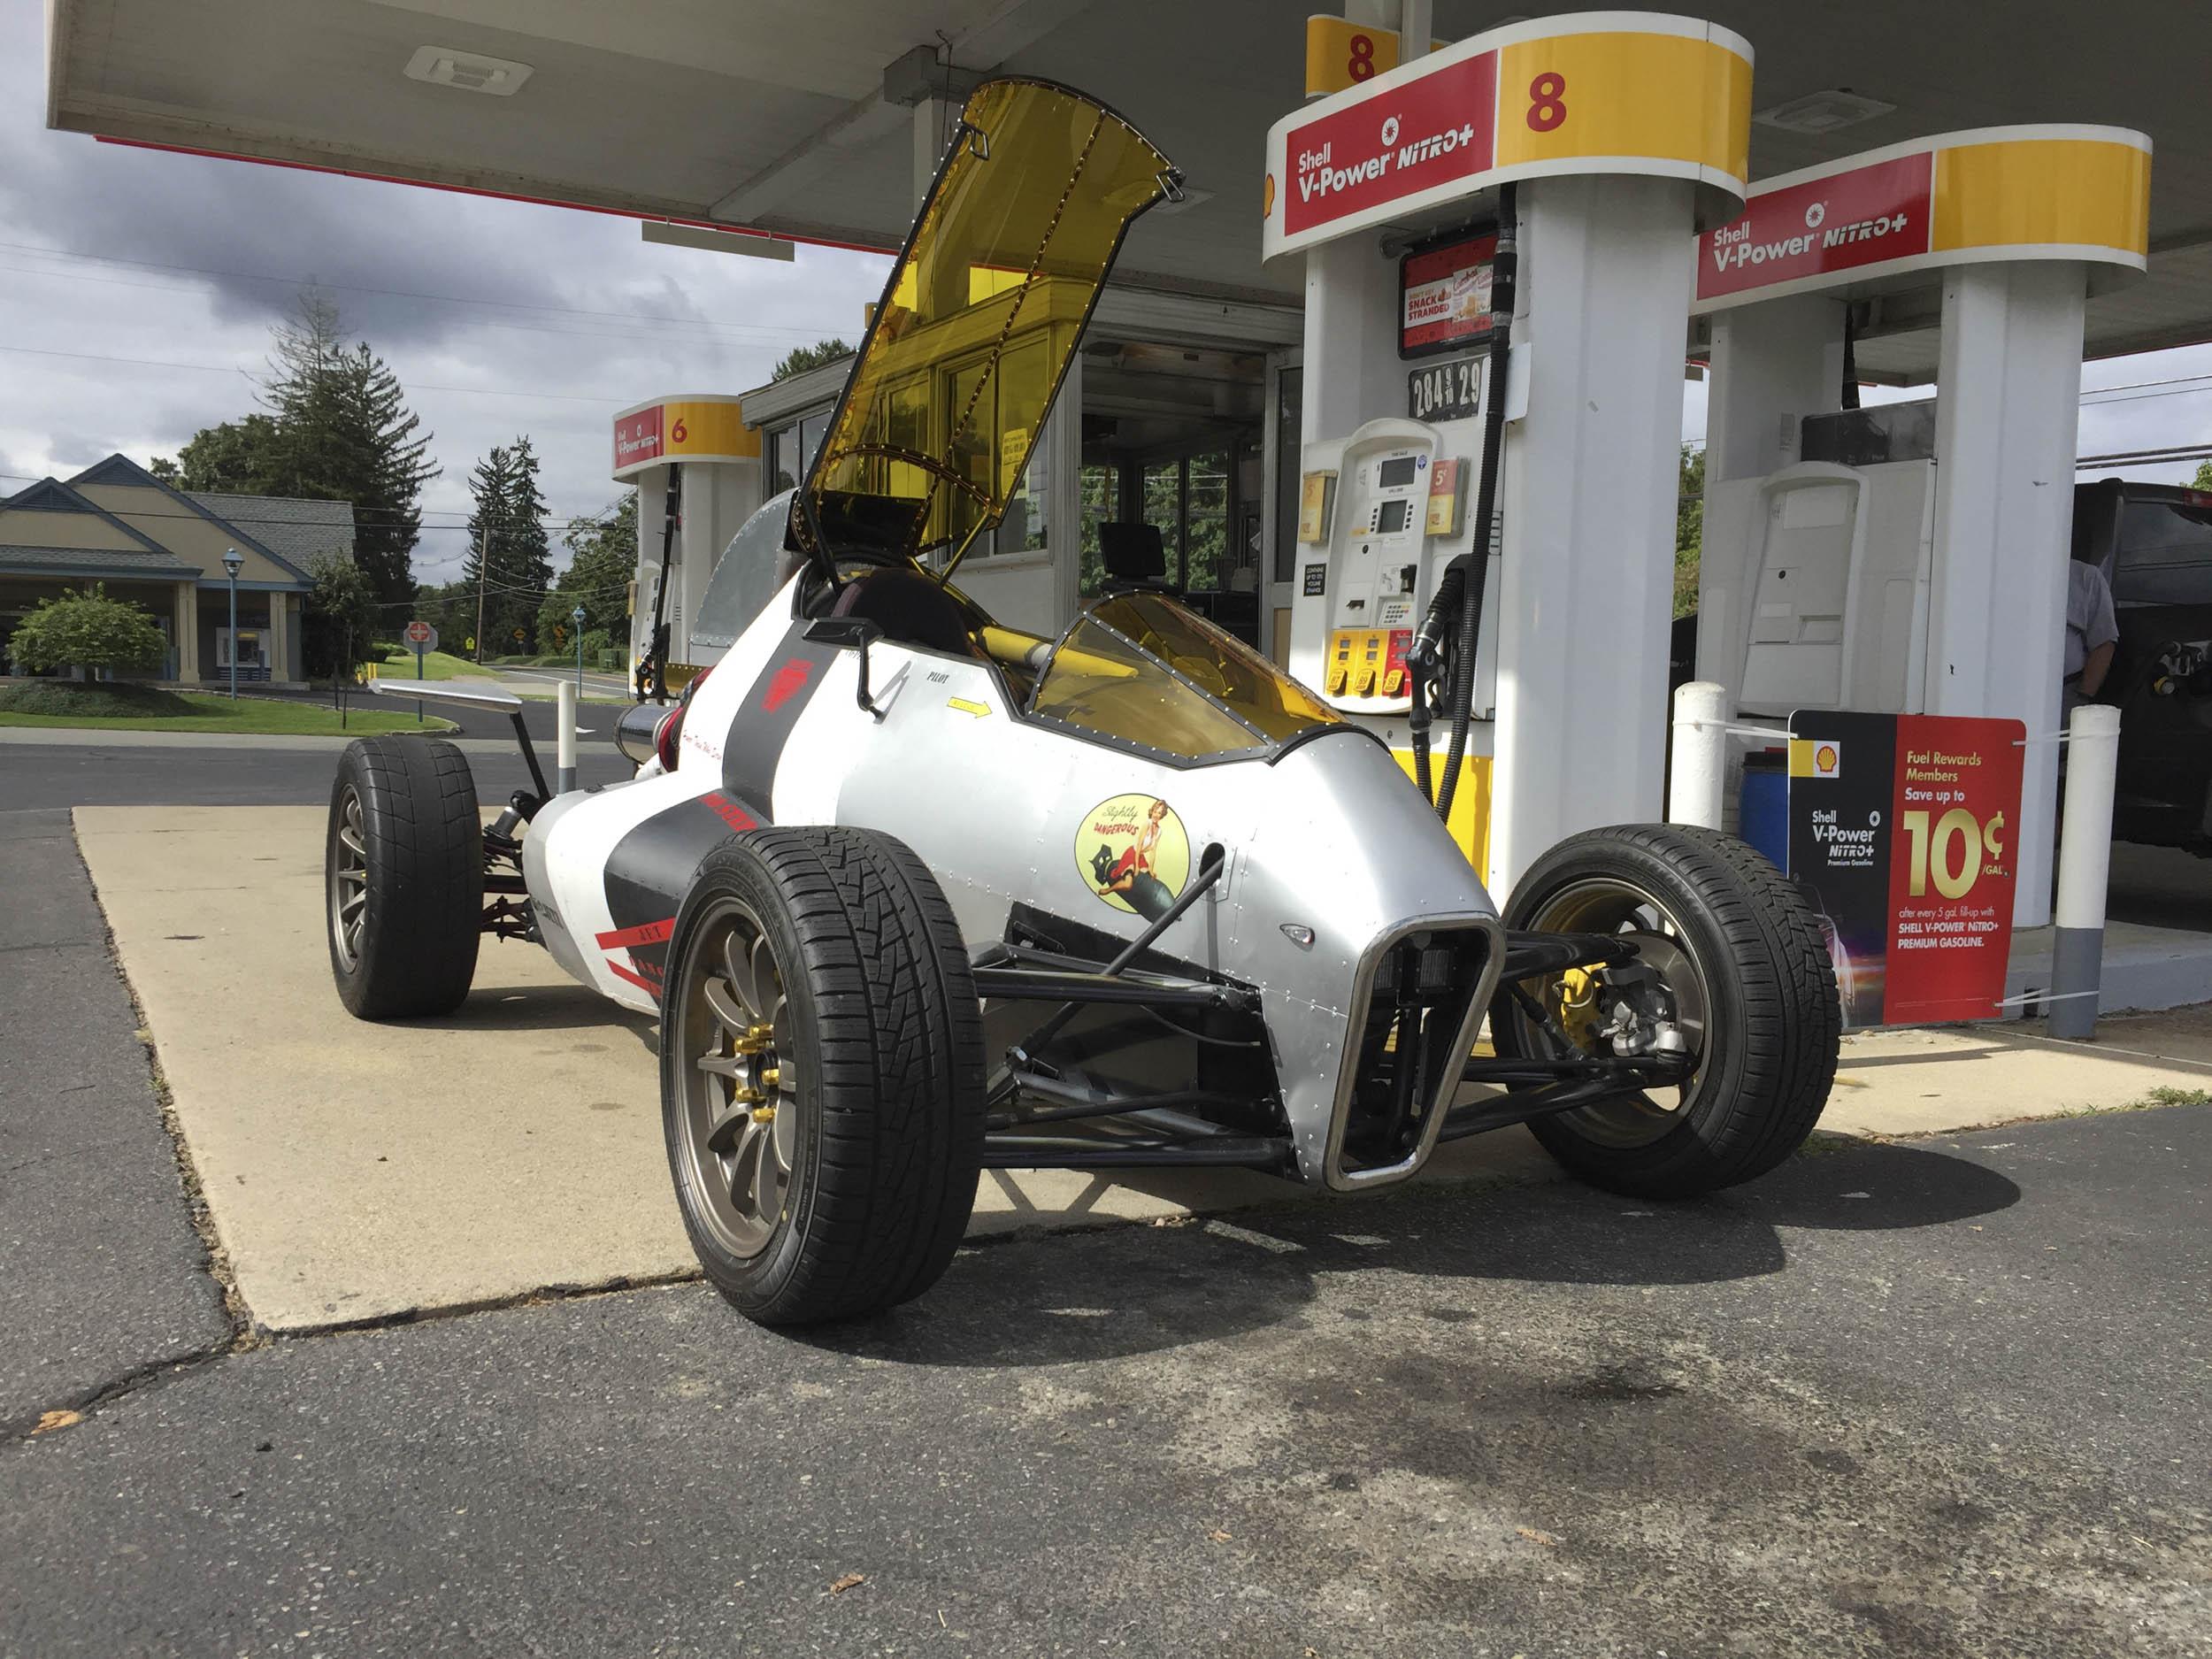 2JetZ fueling up